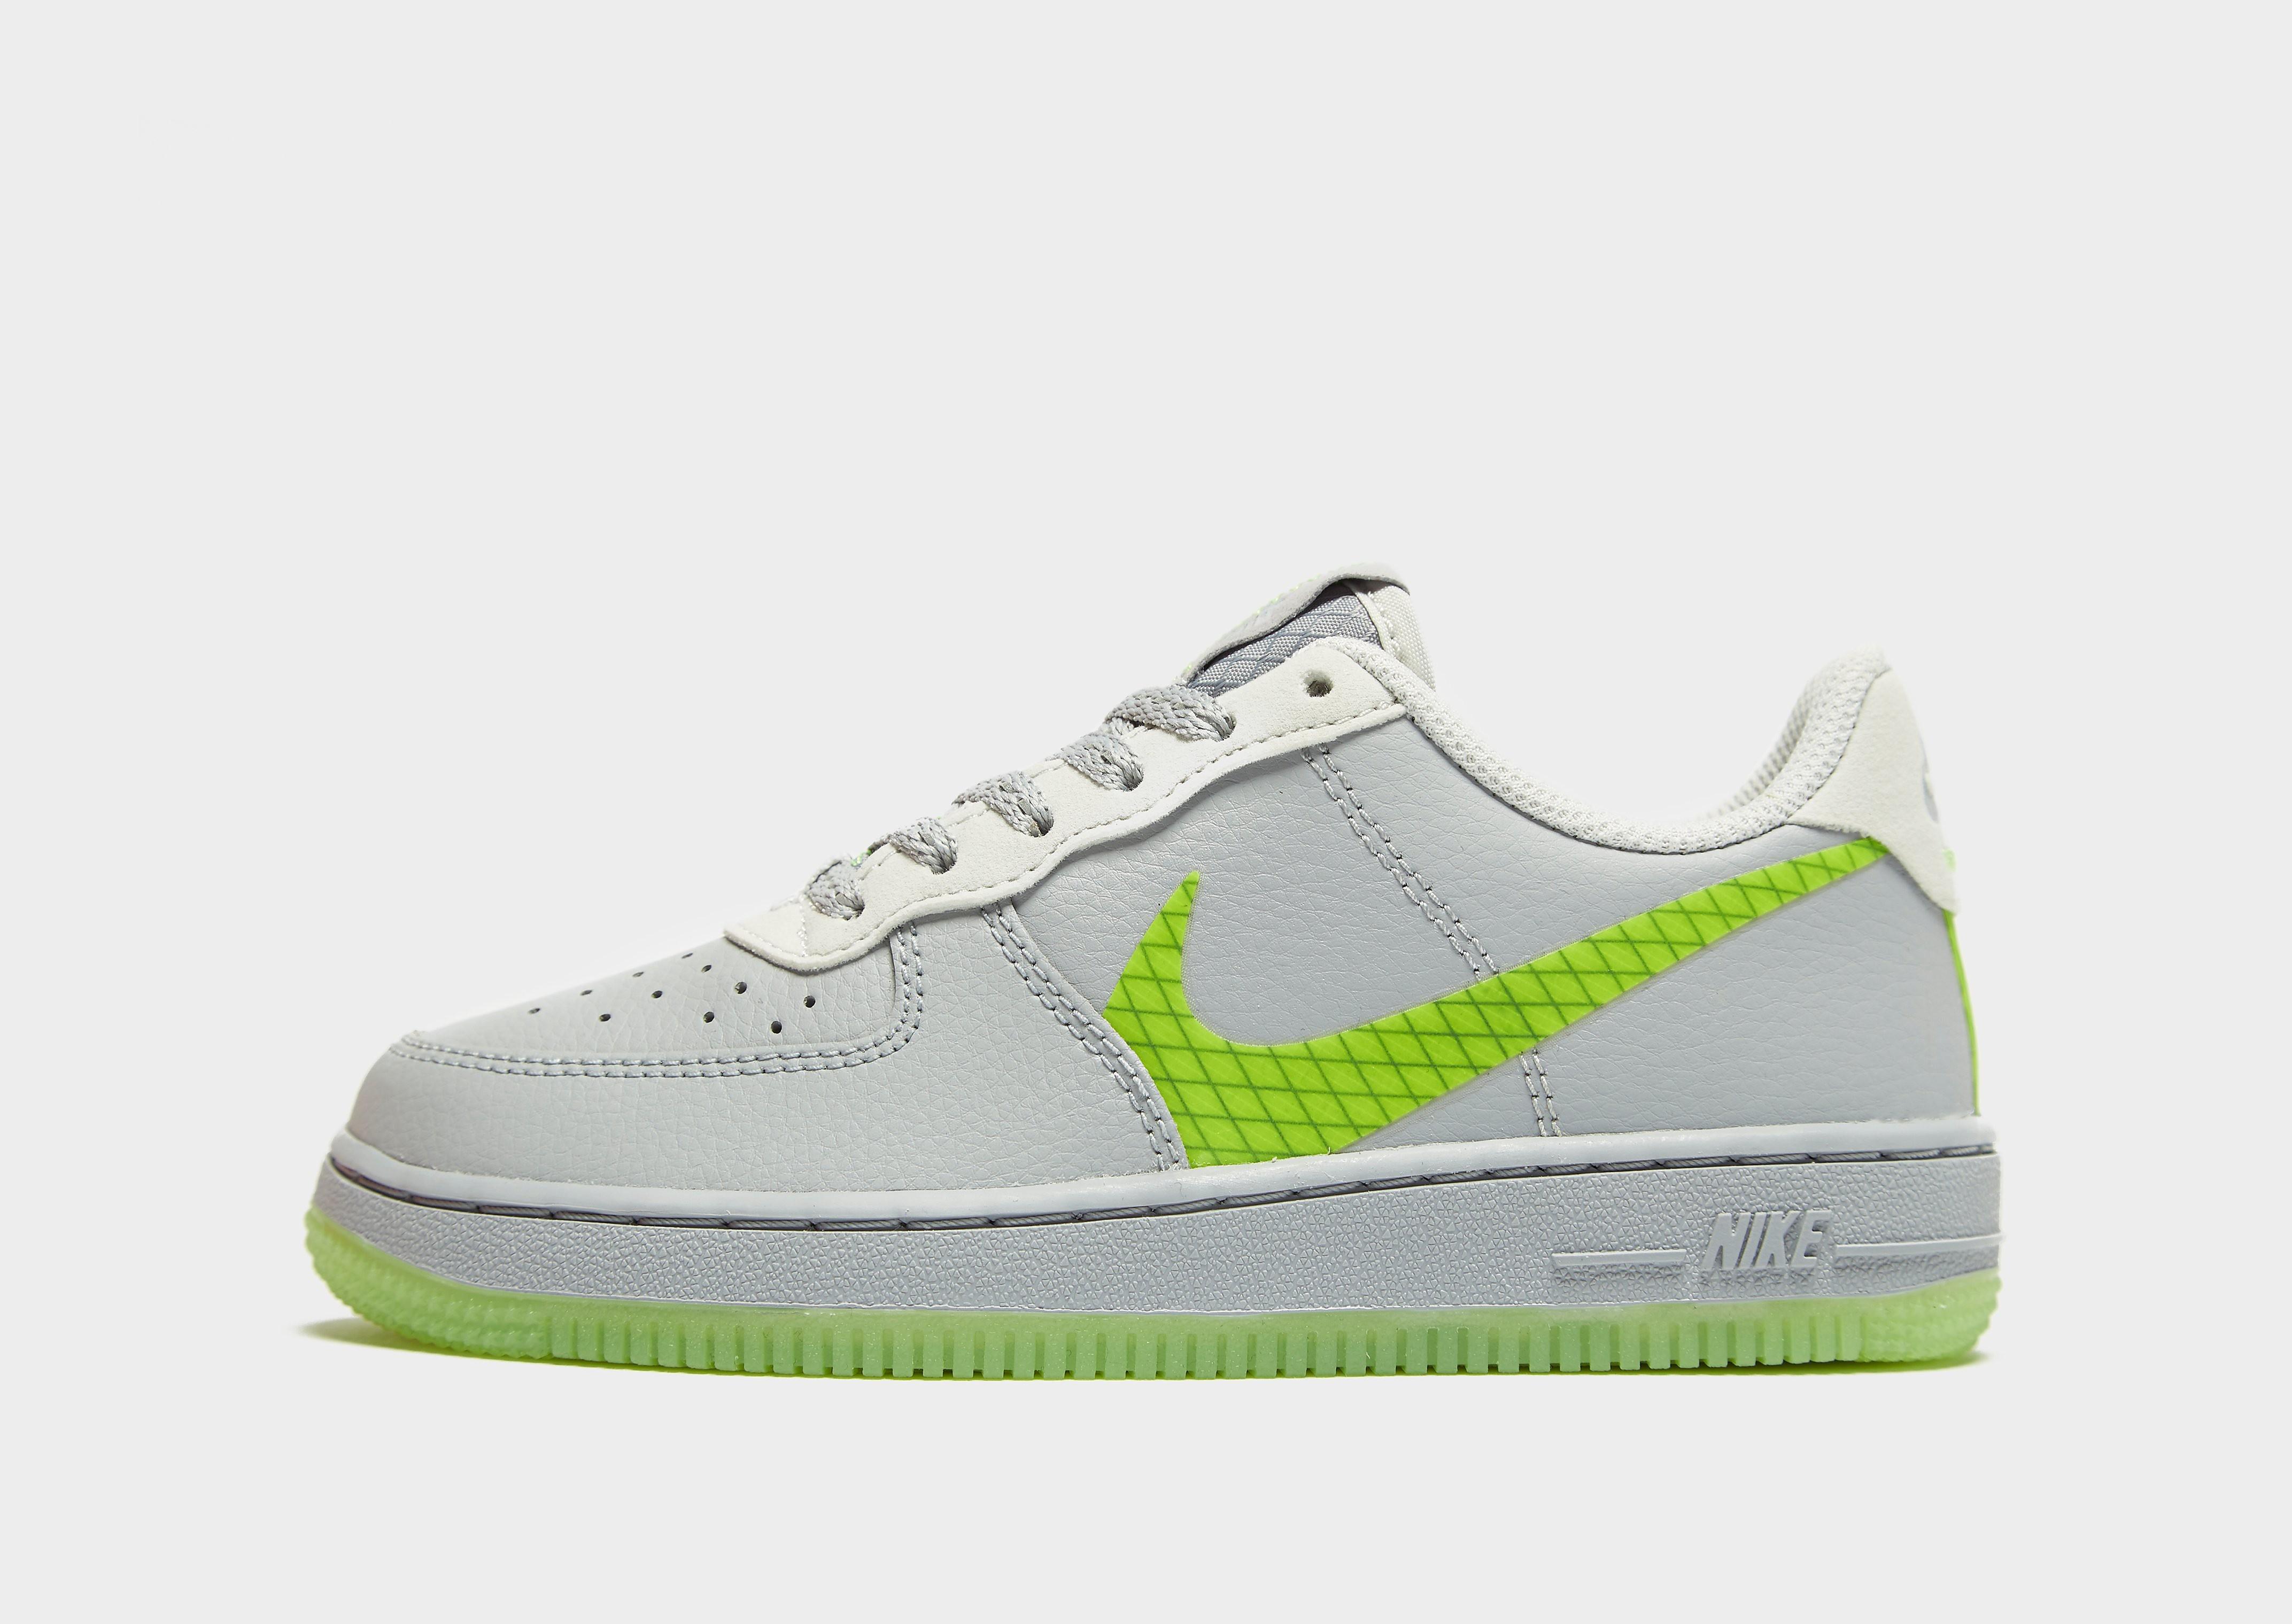 Nike Air Force 1 Low Children Grijs Kind Grijs